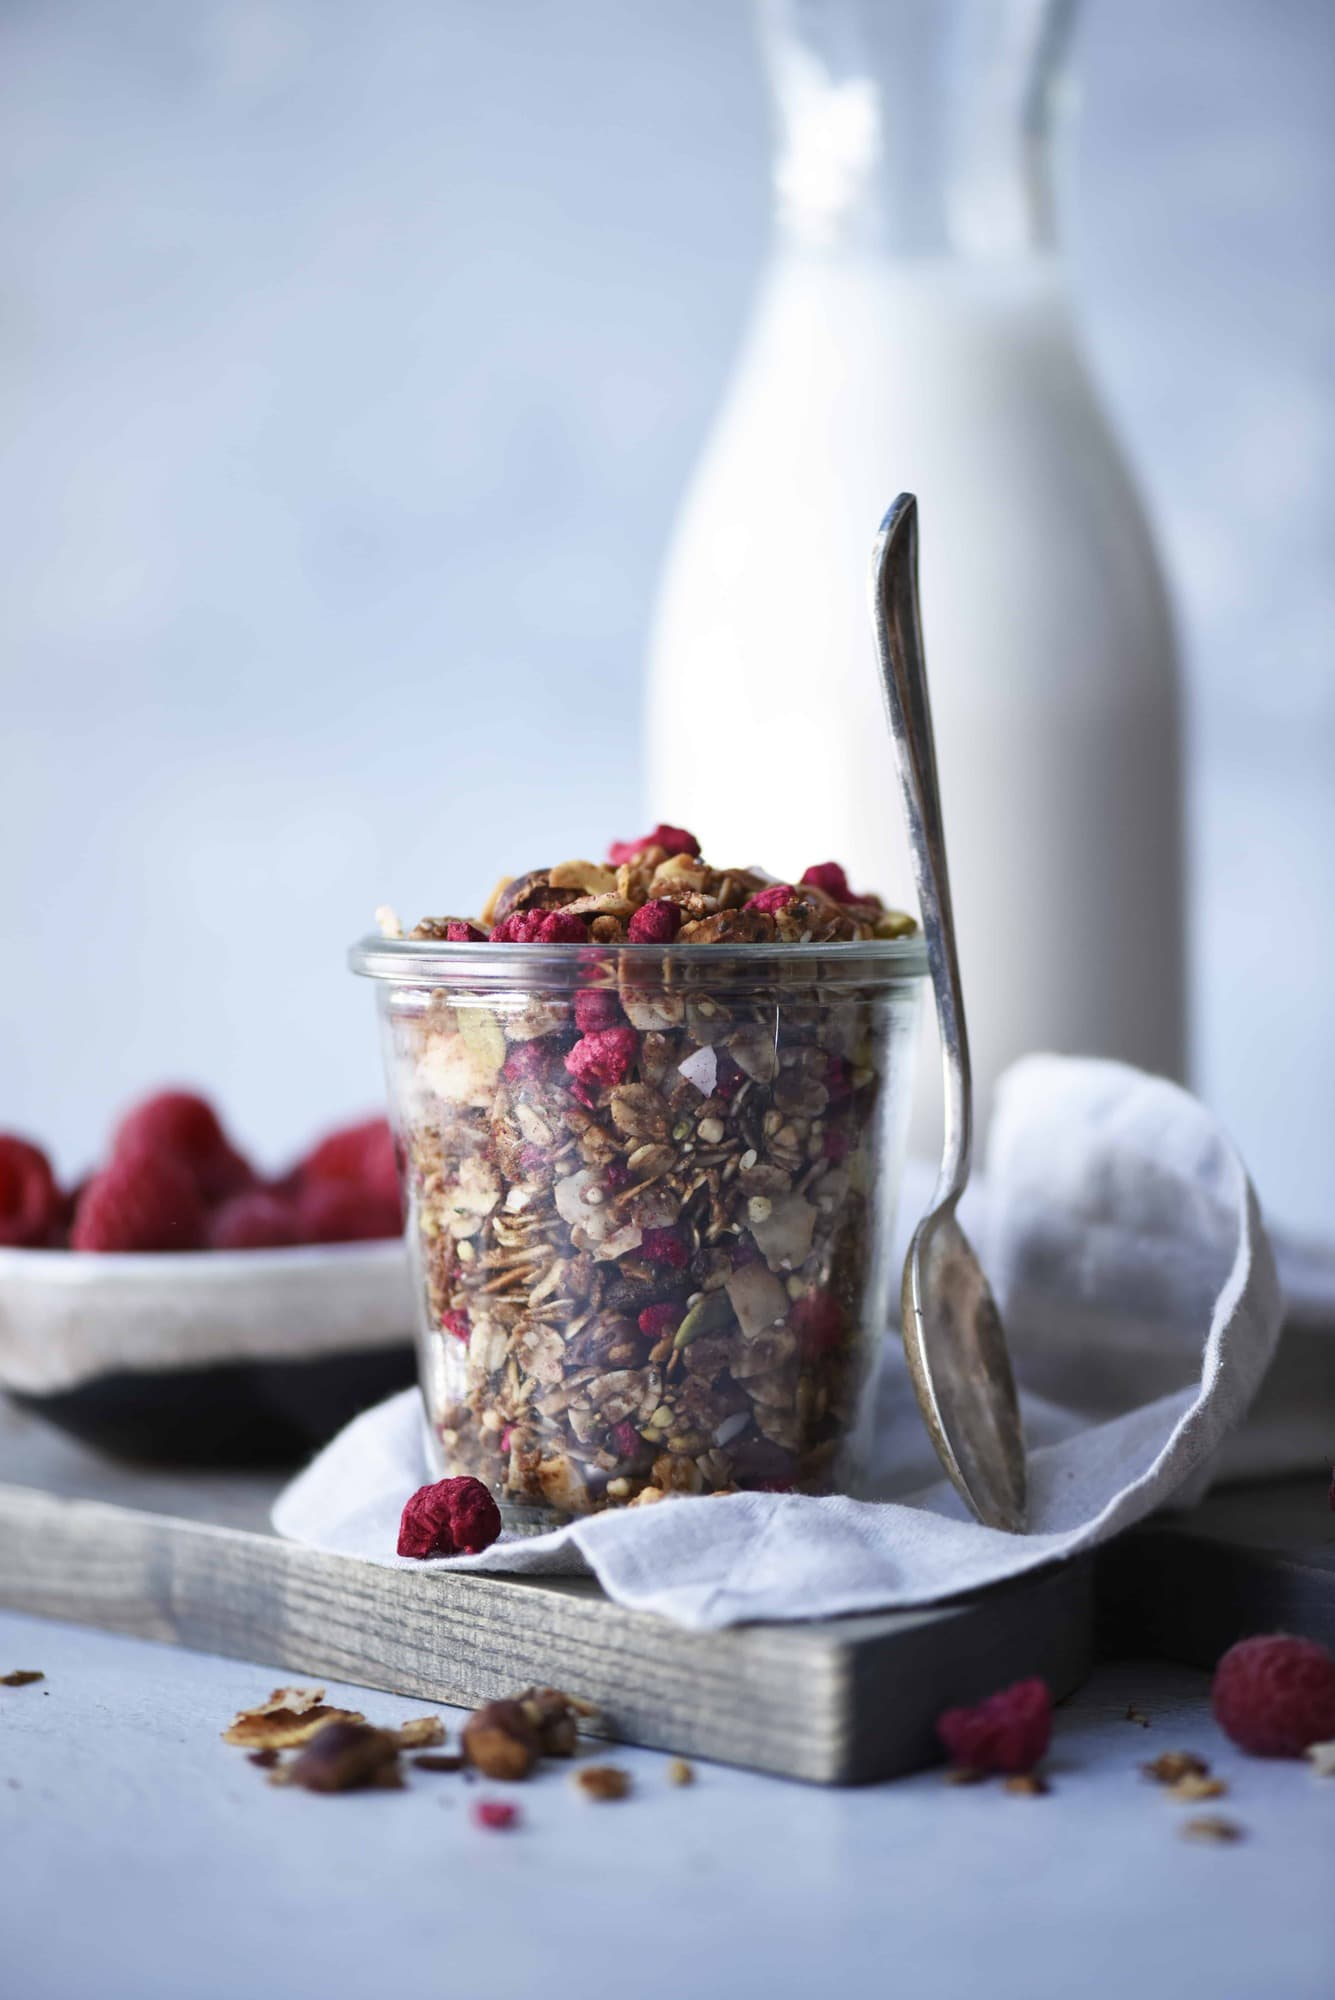 Side view of chocolate hazelnut raspberry granola in a glass jar with milk in the background